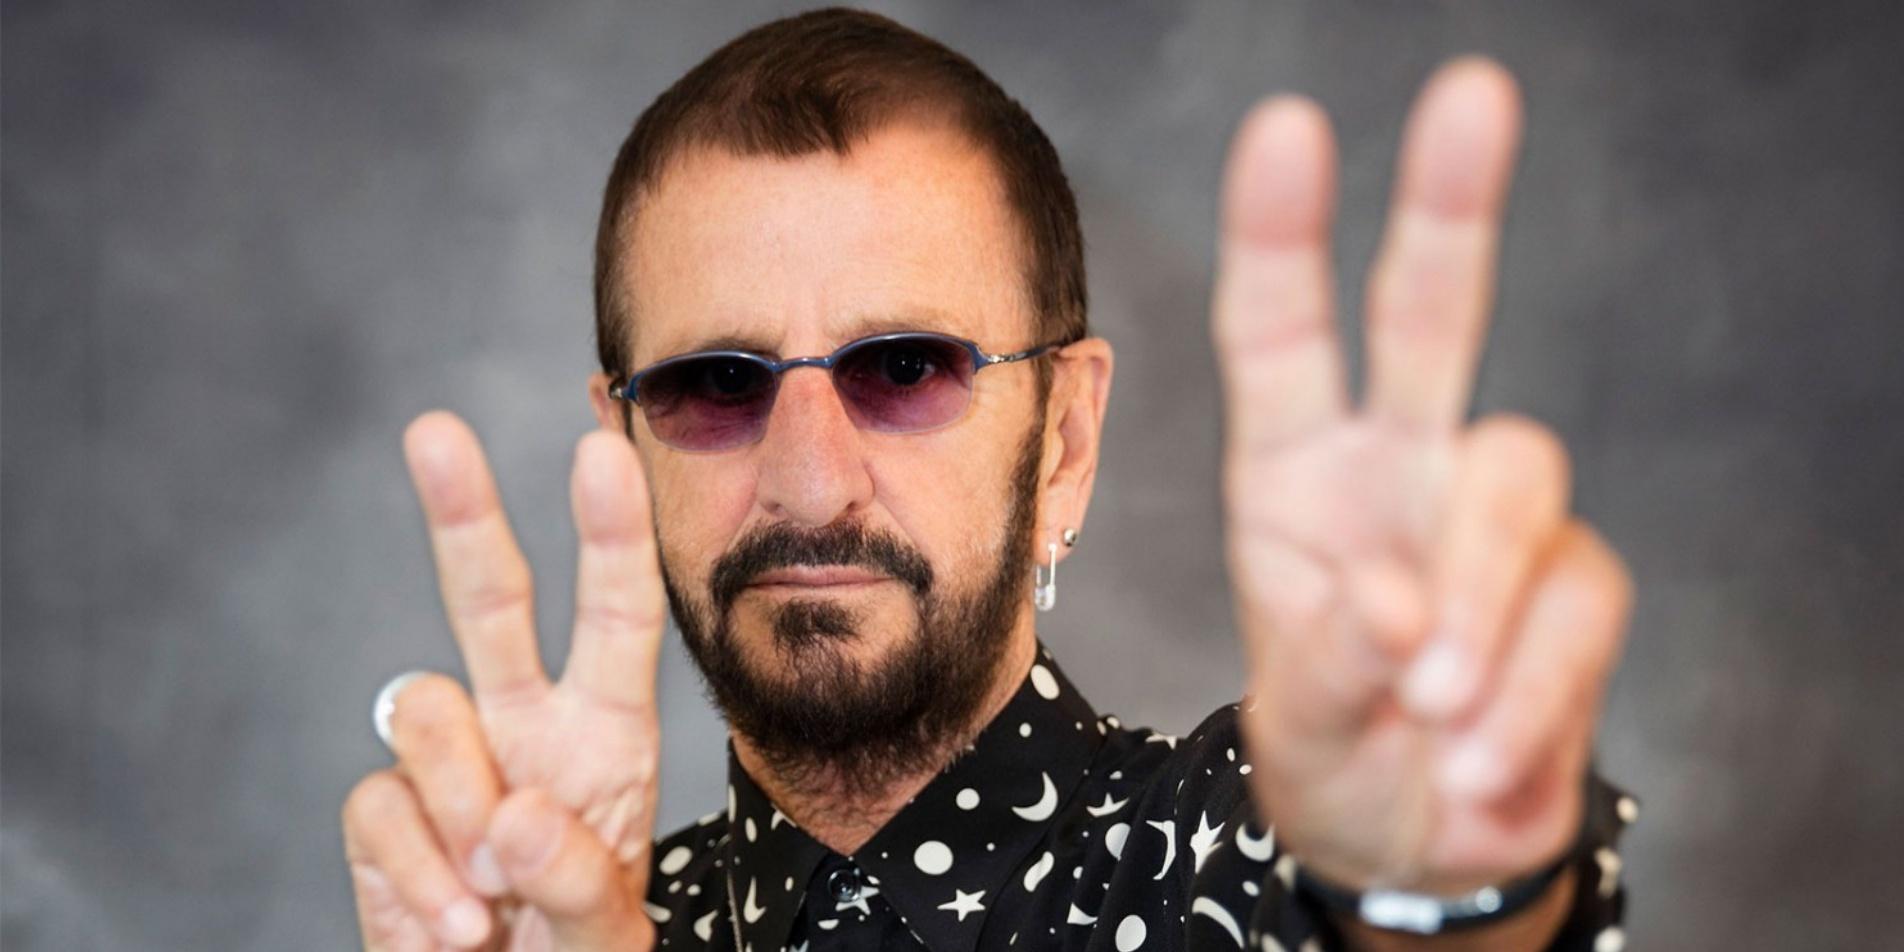 Ringo Starr reveals he's working on a new album